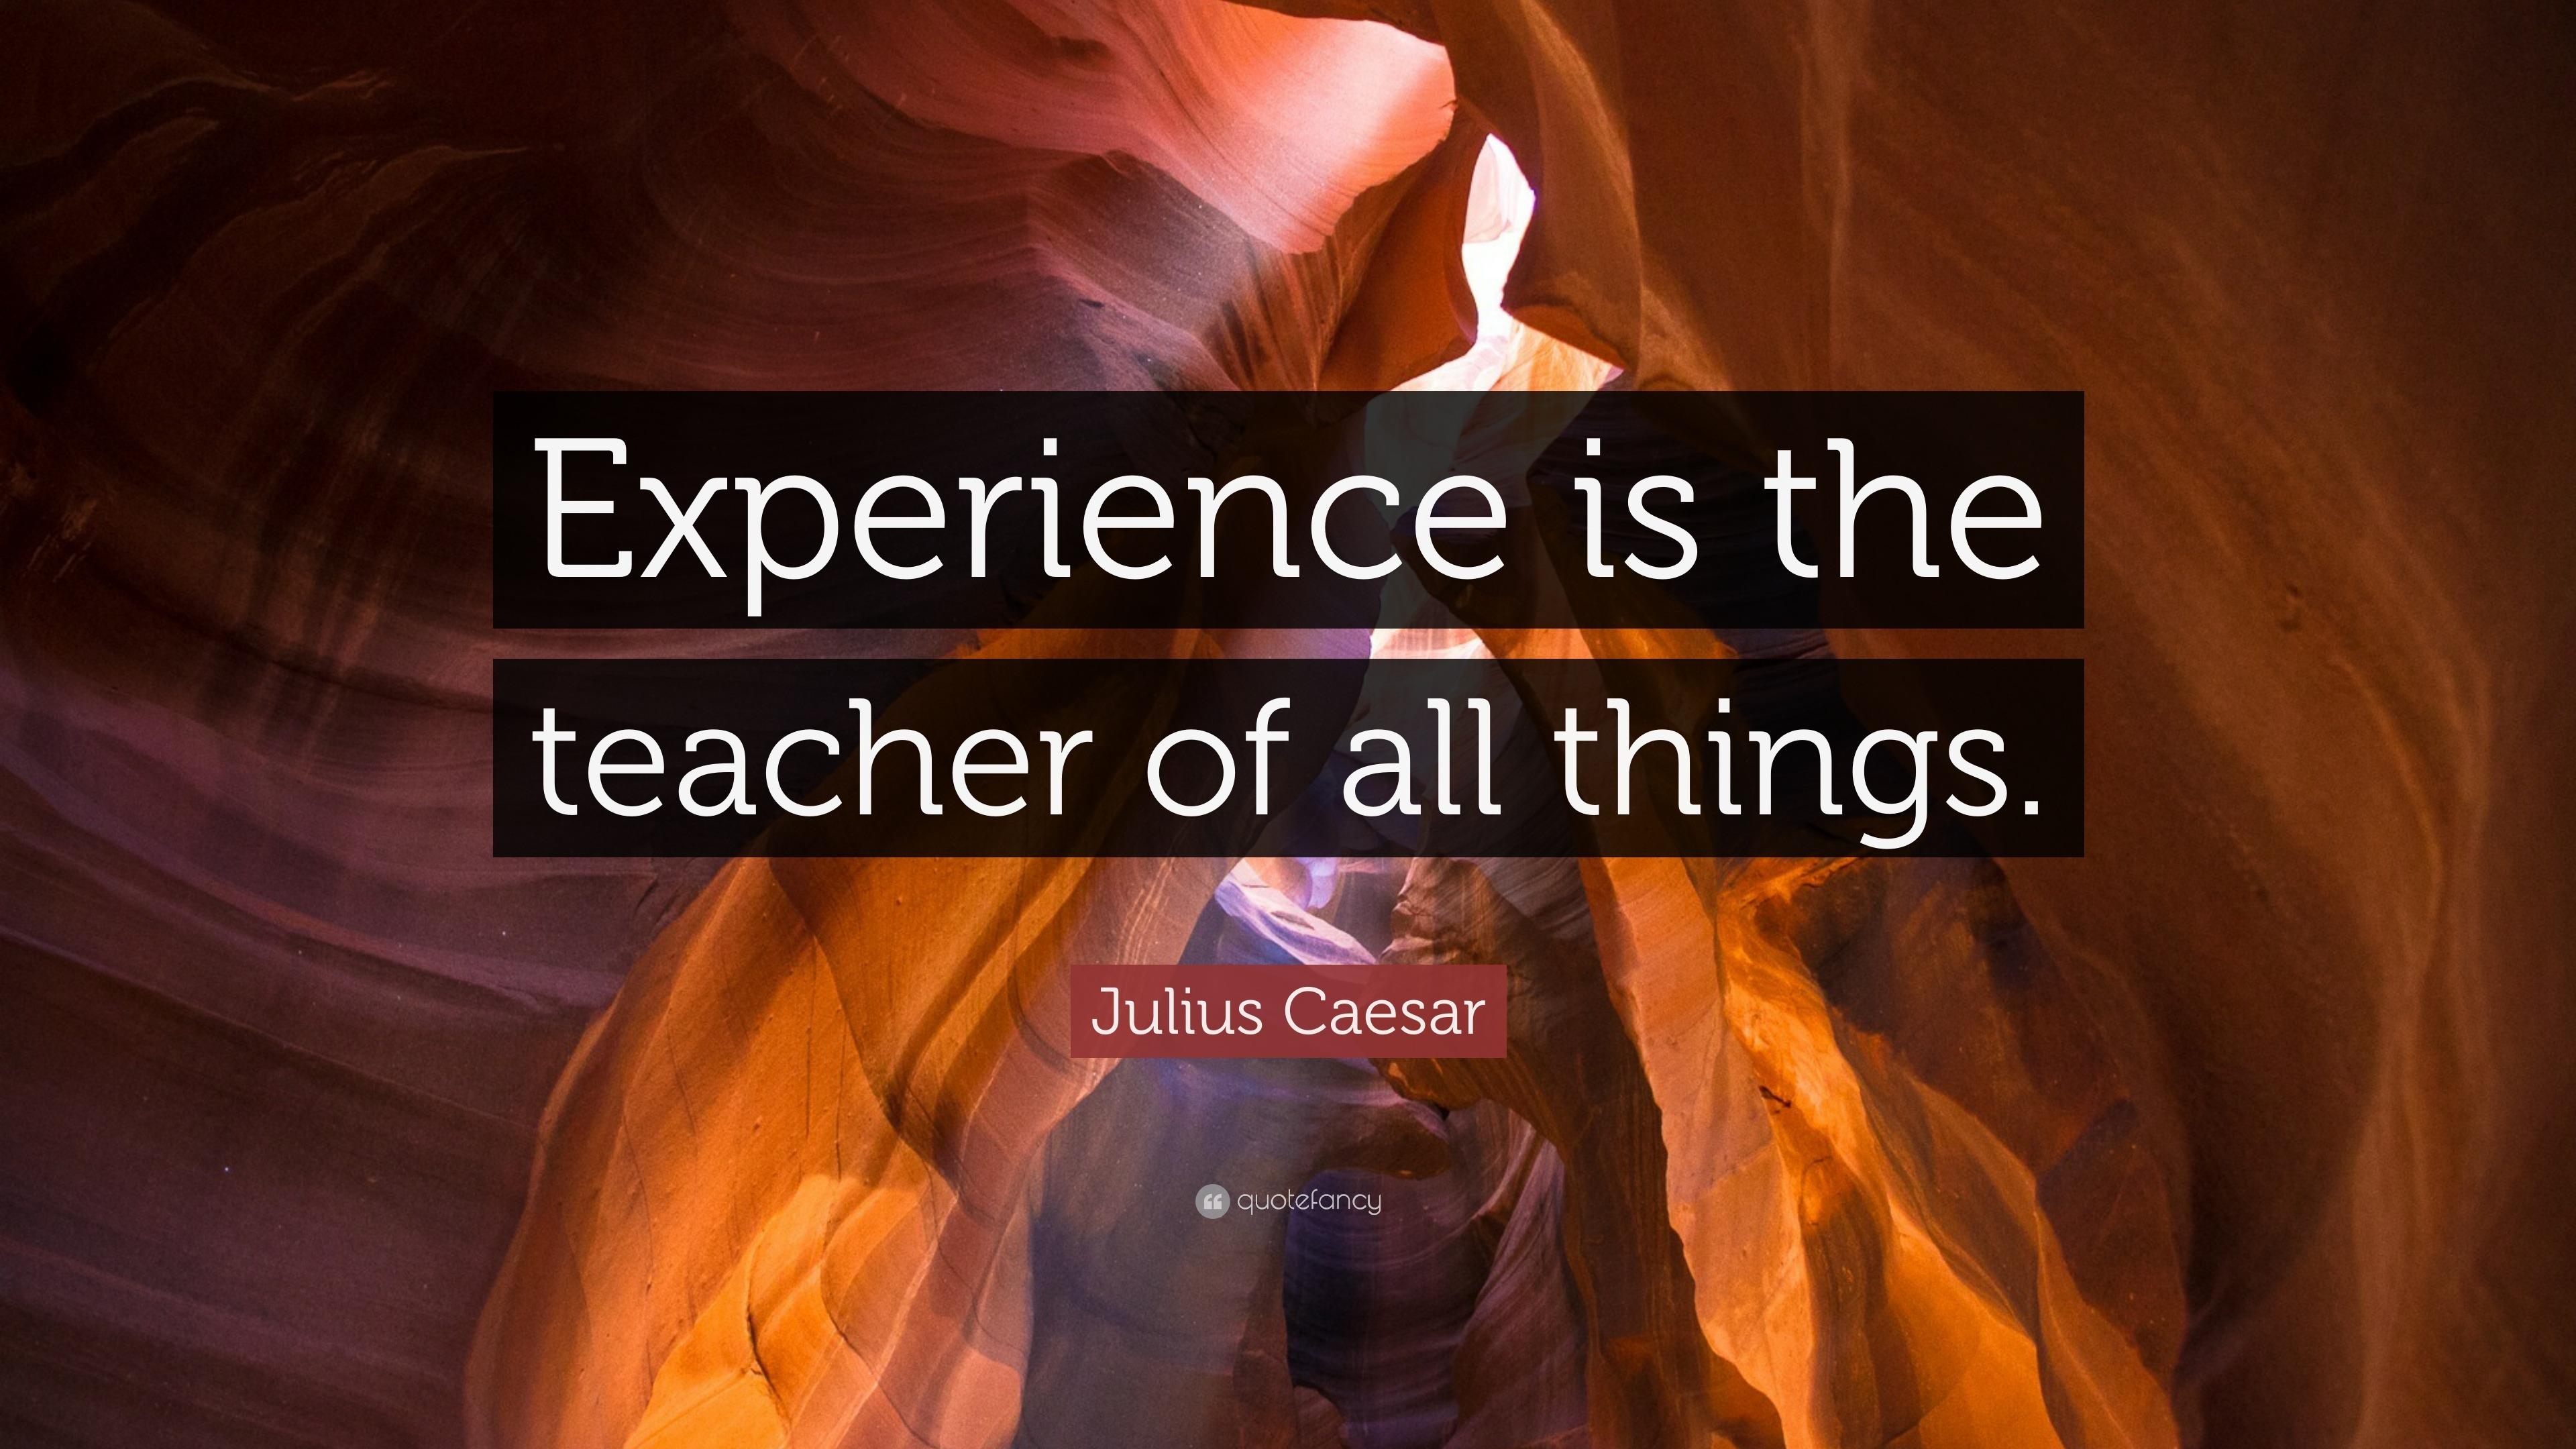 Julius Caesar Quote Experience Is The Teacher Of All